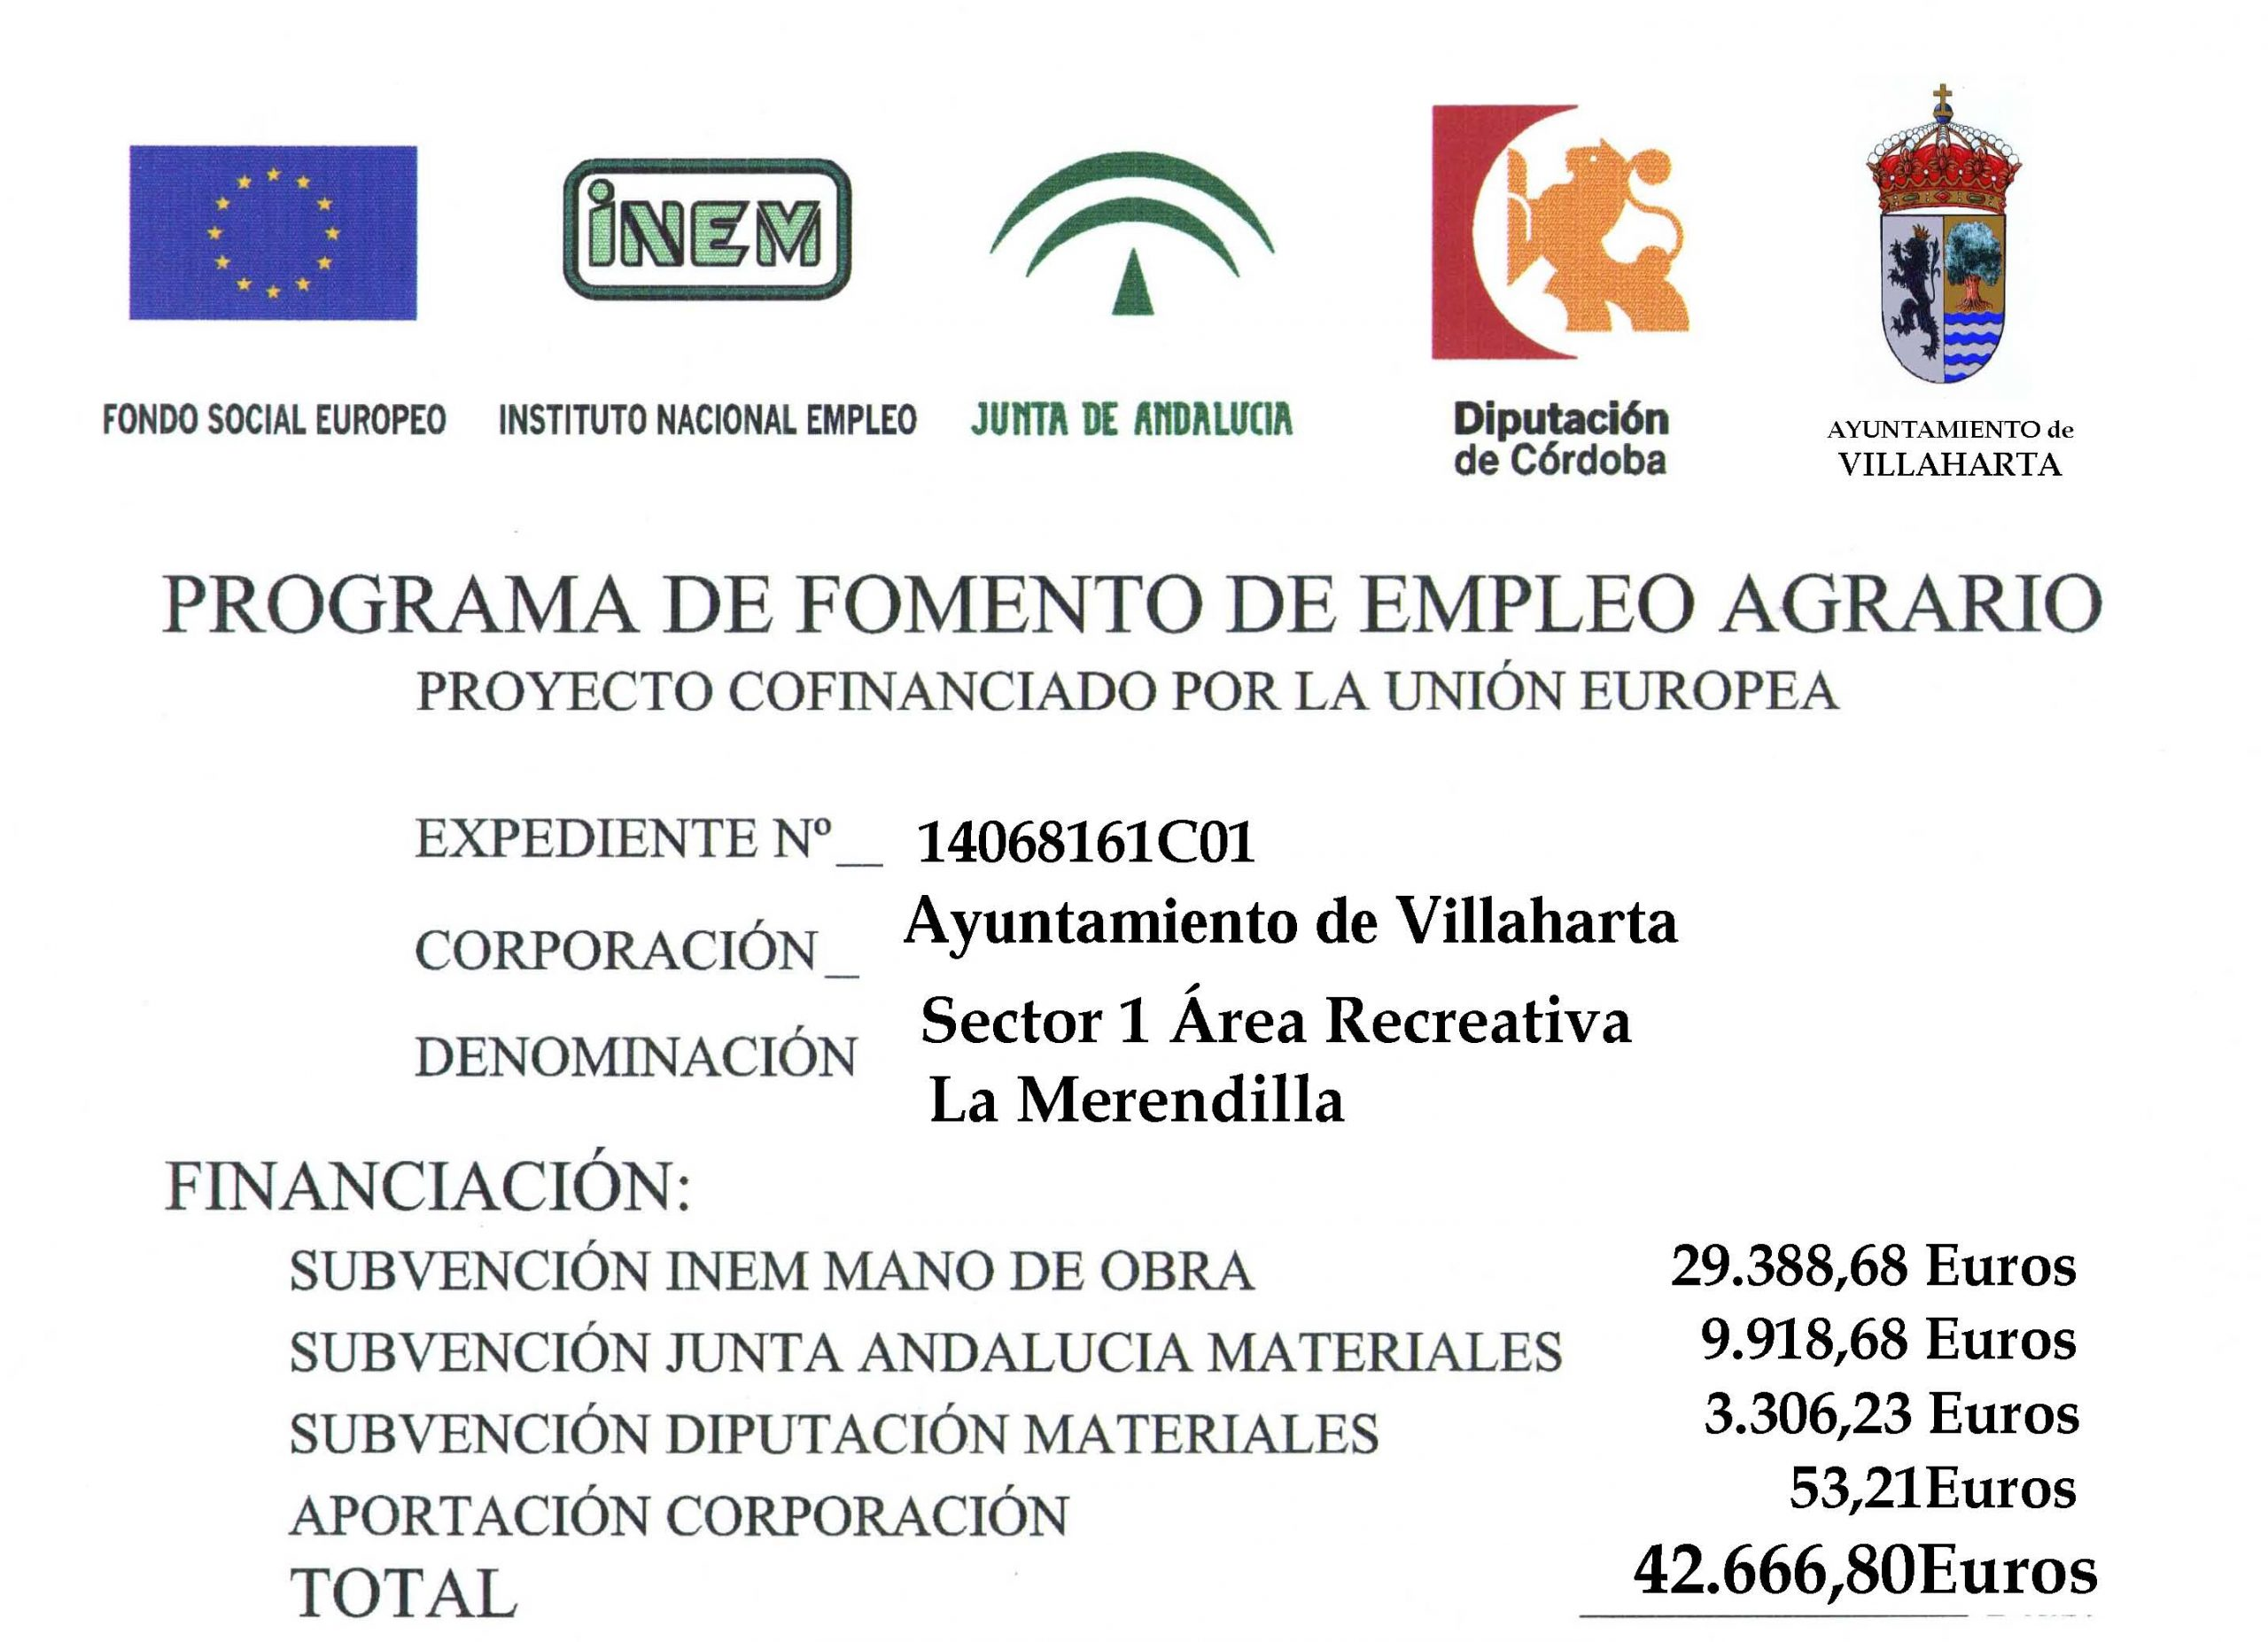 PROGRAMA DE FOMENTO DEL EMPLEO AGRARIO 2016 1